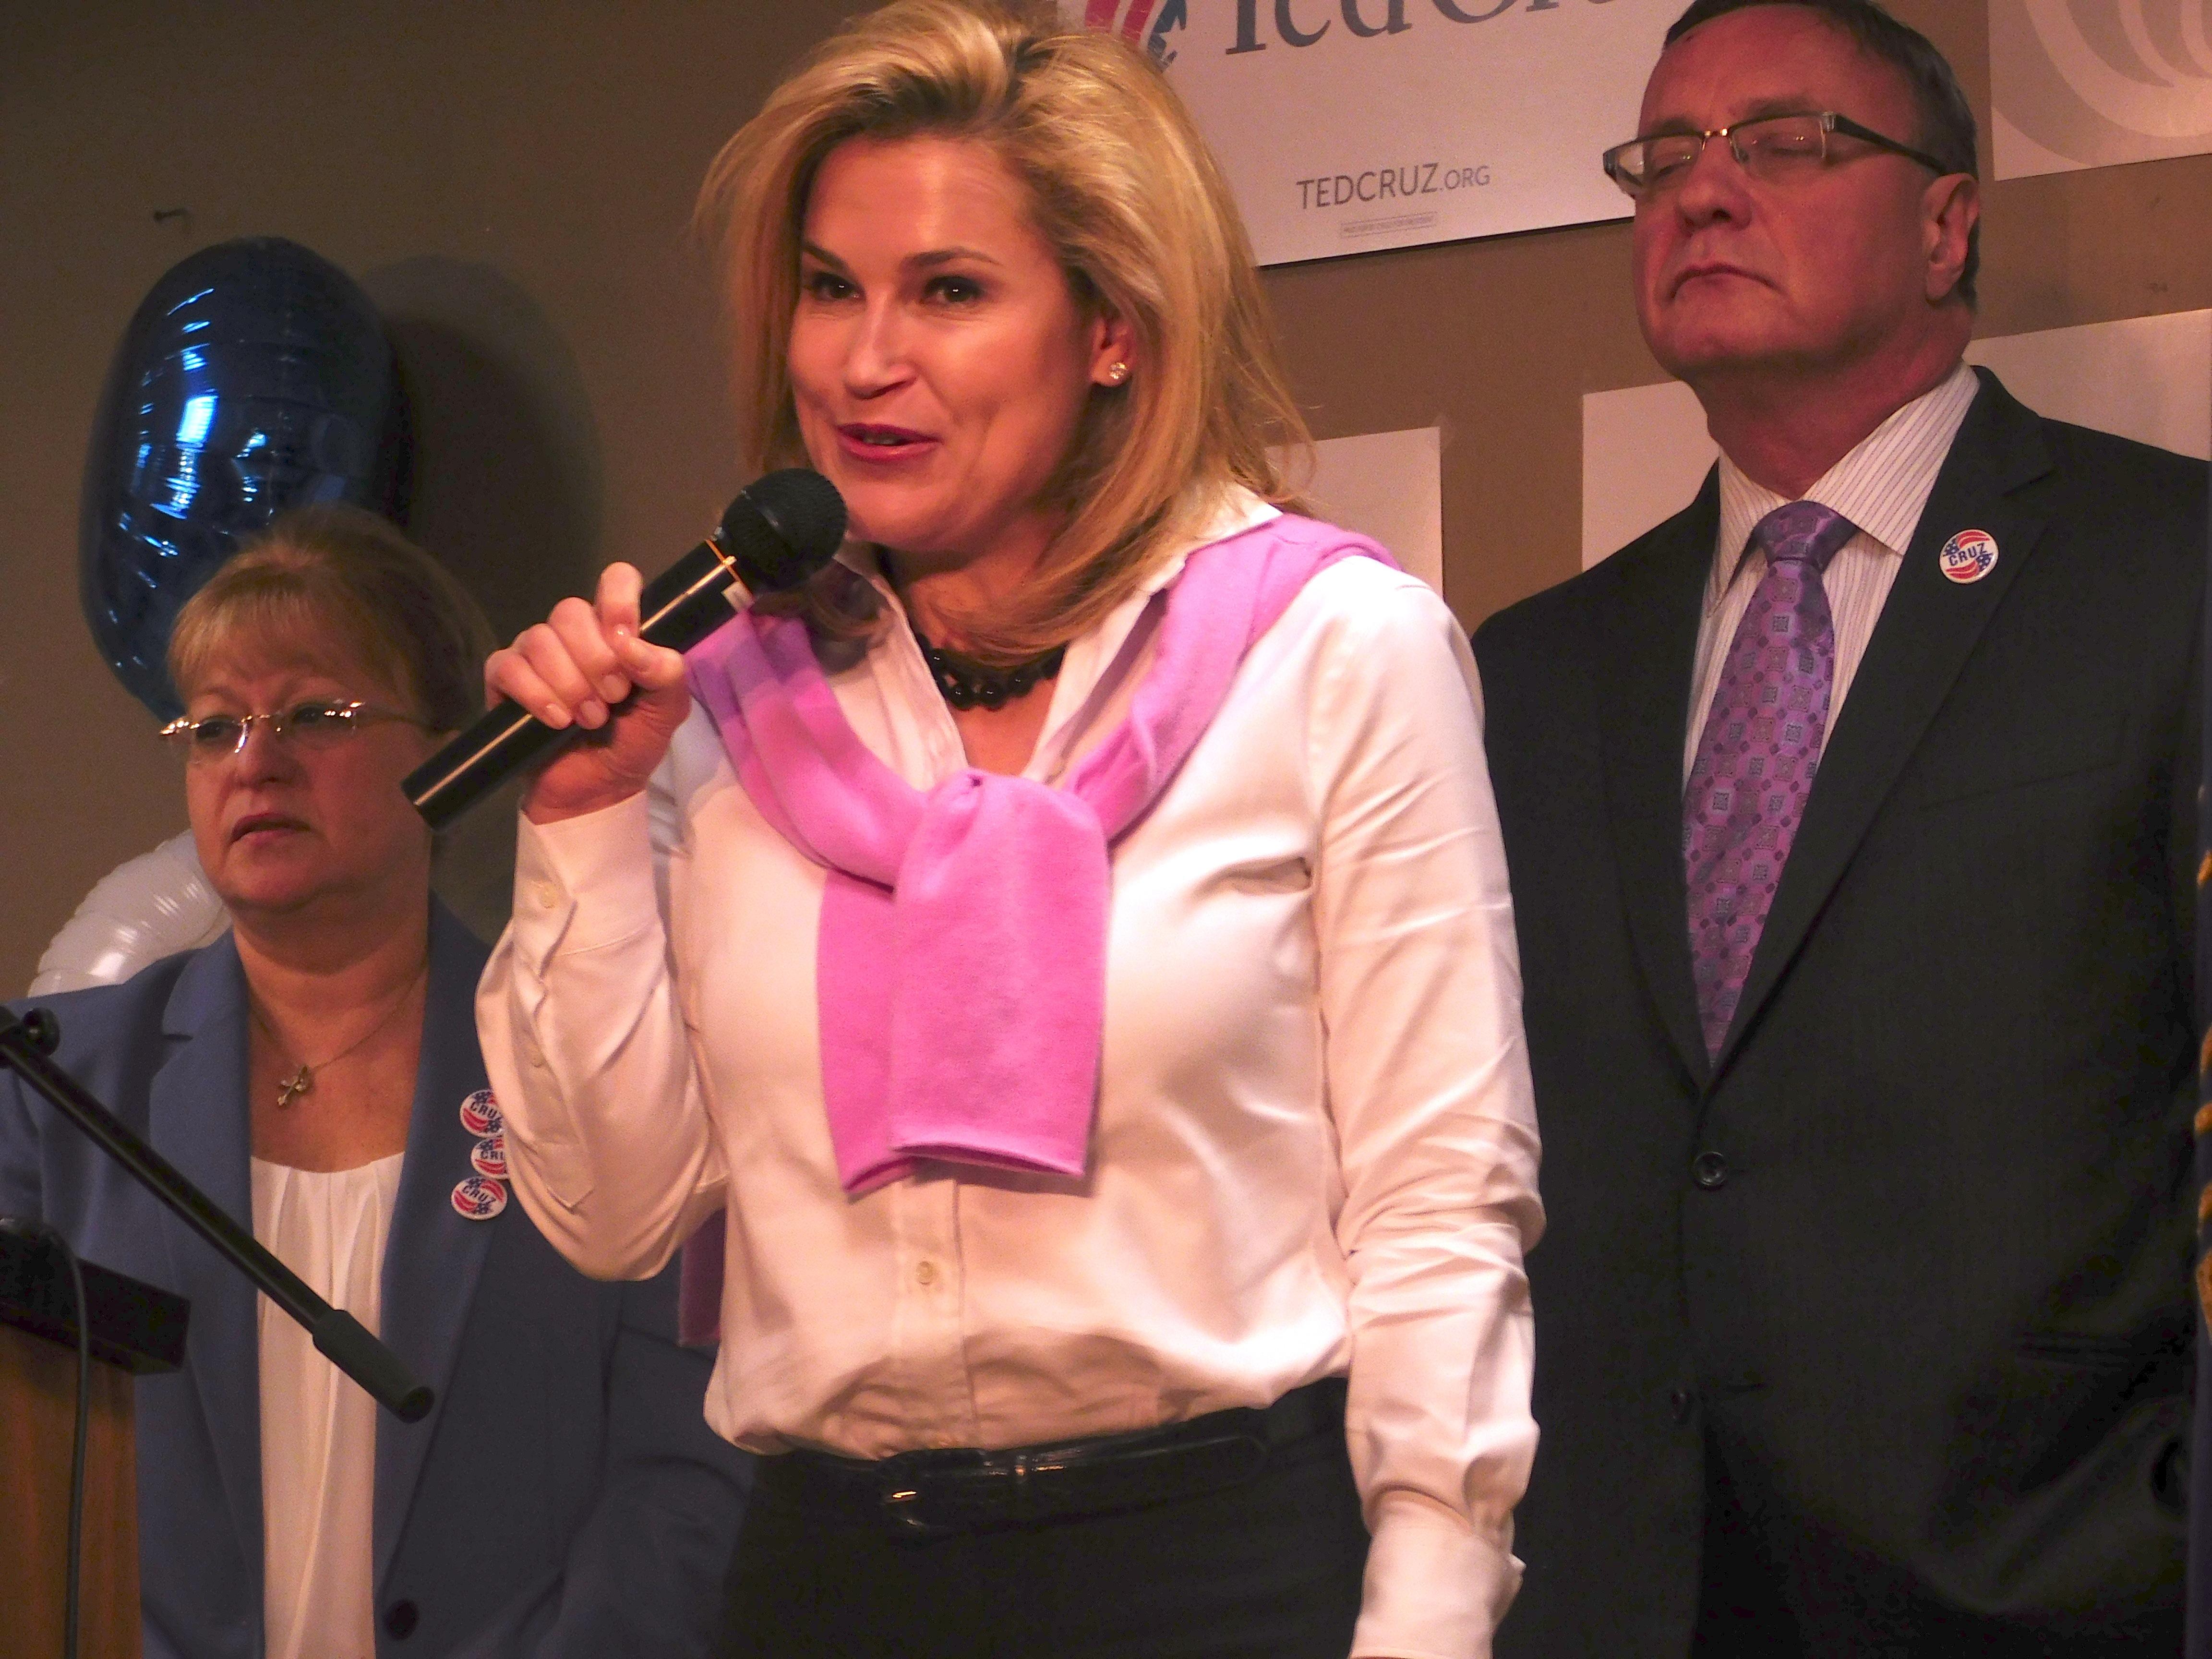 Heidi Cruz at an event in Wayne.